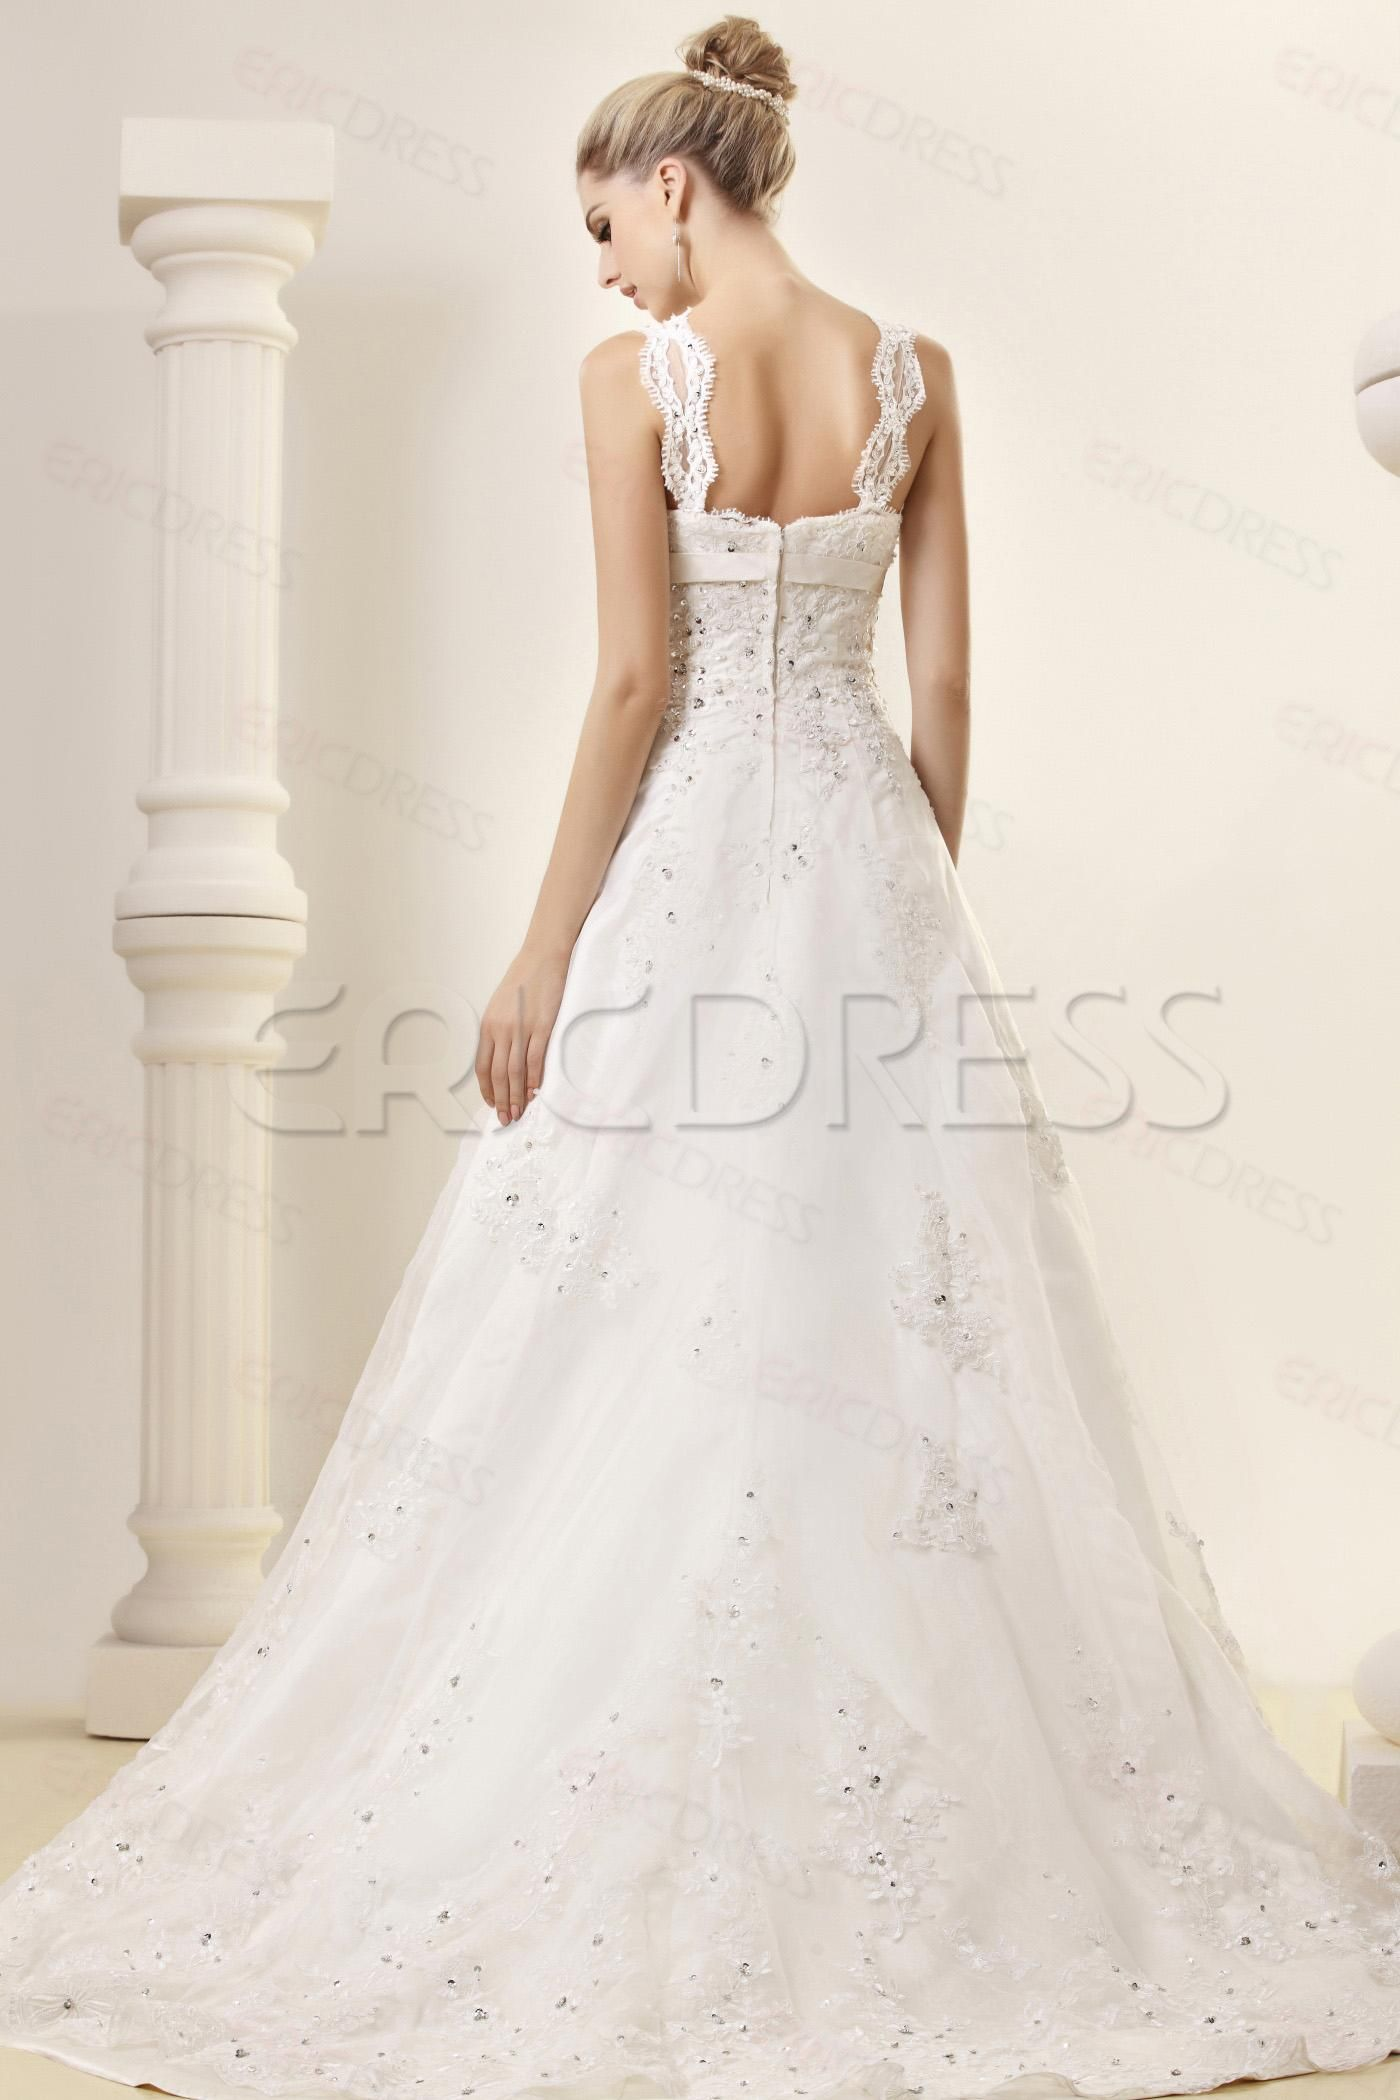 Pin by olivia furlong on wedding uc pinterest square necklines